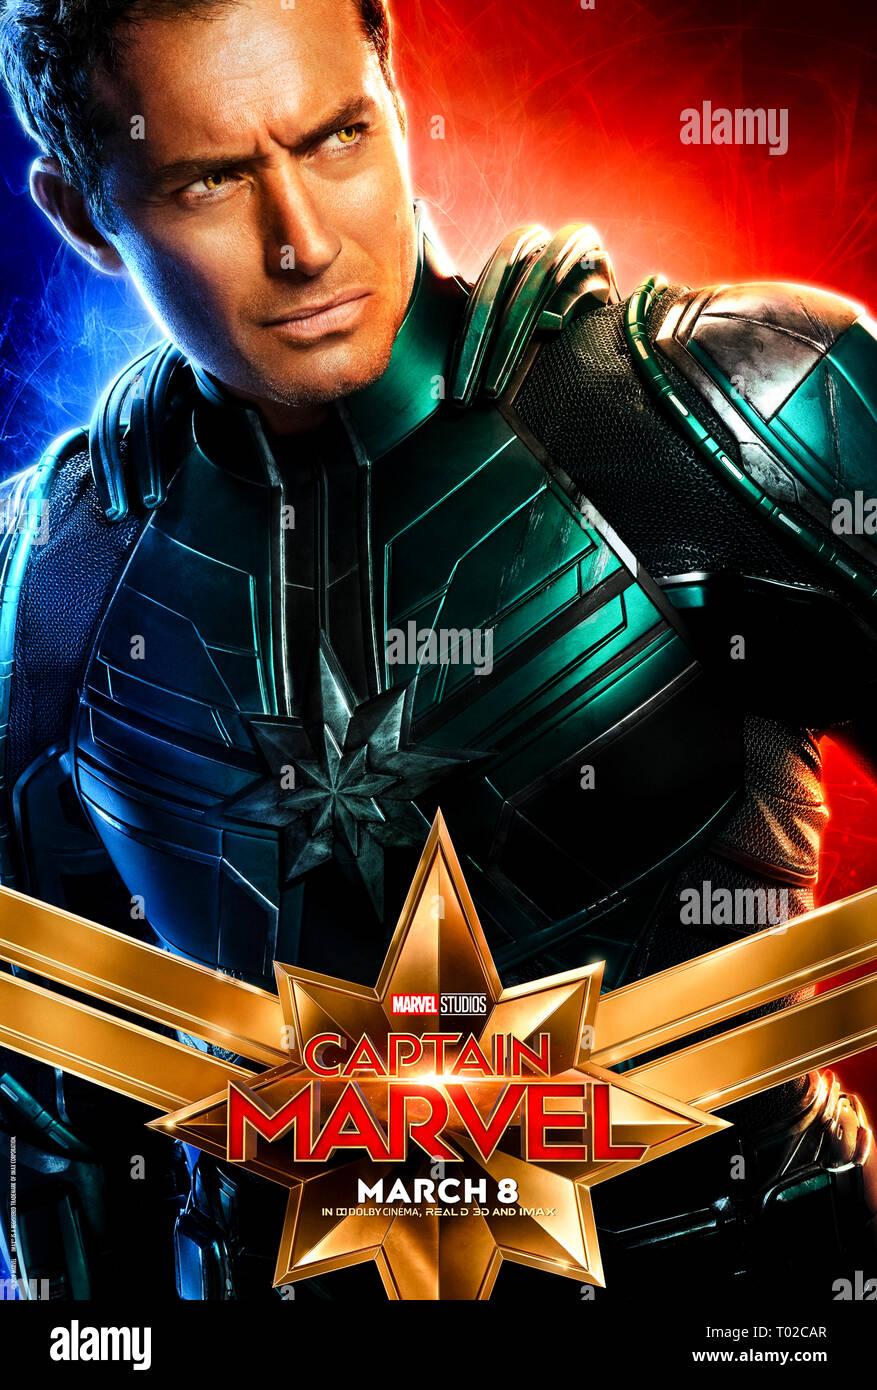 captain marvel poster stockfotos und